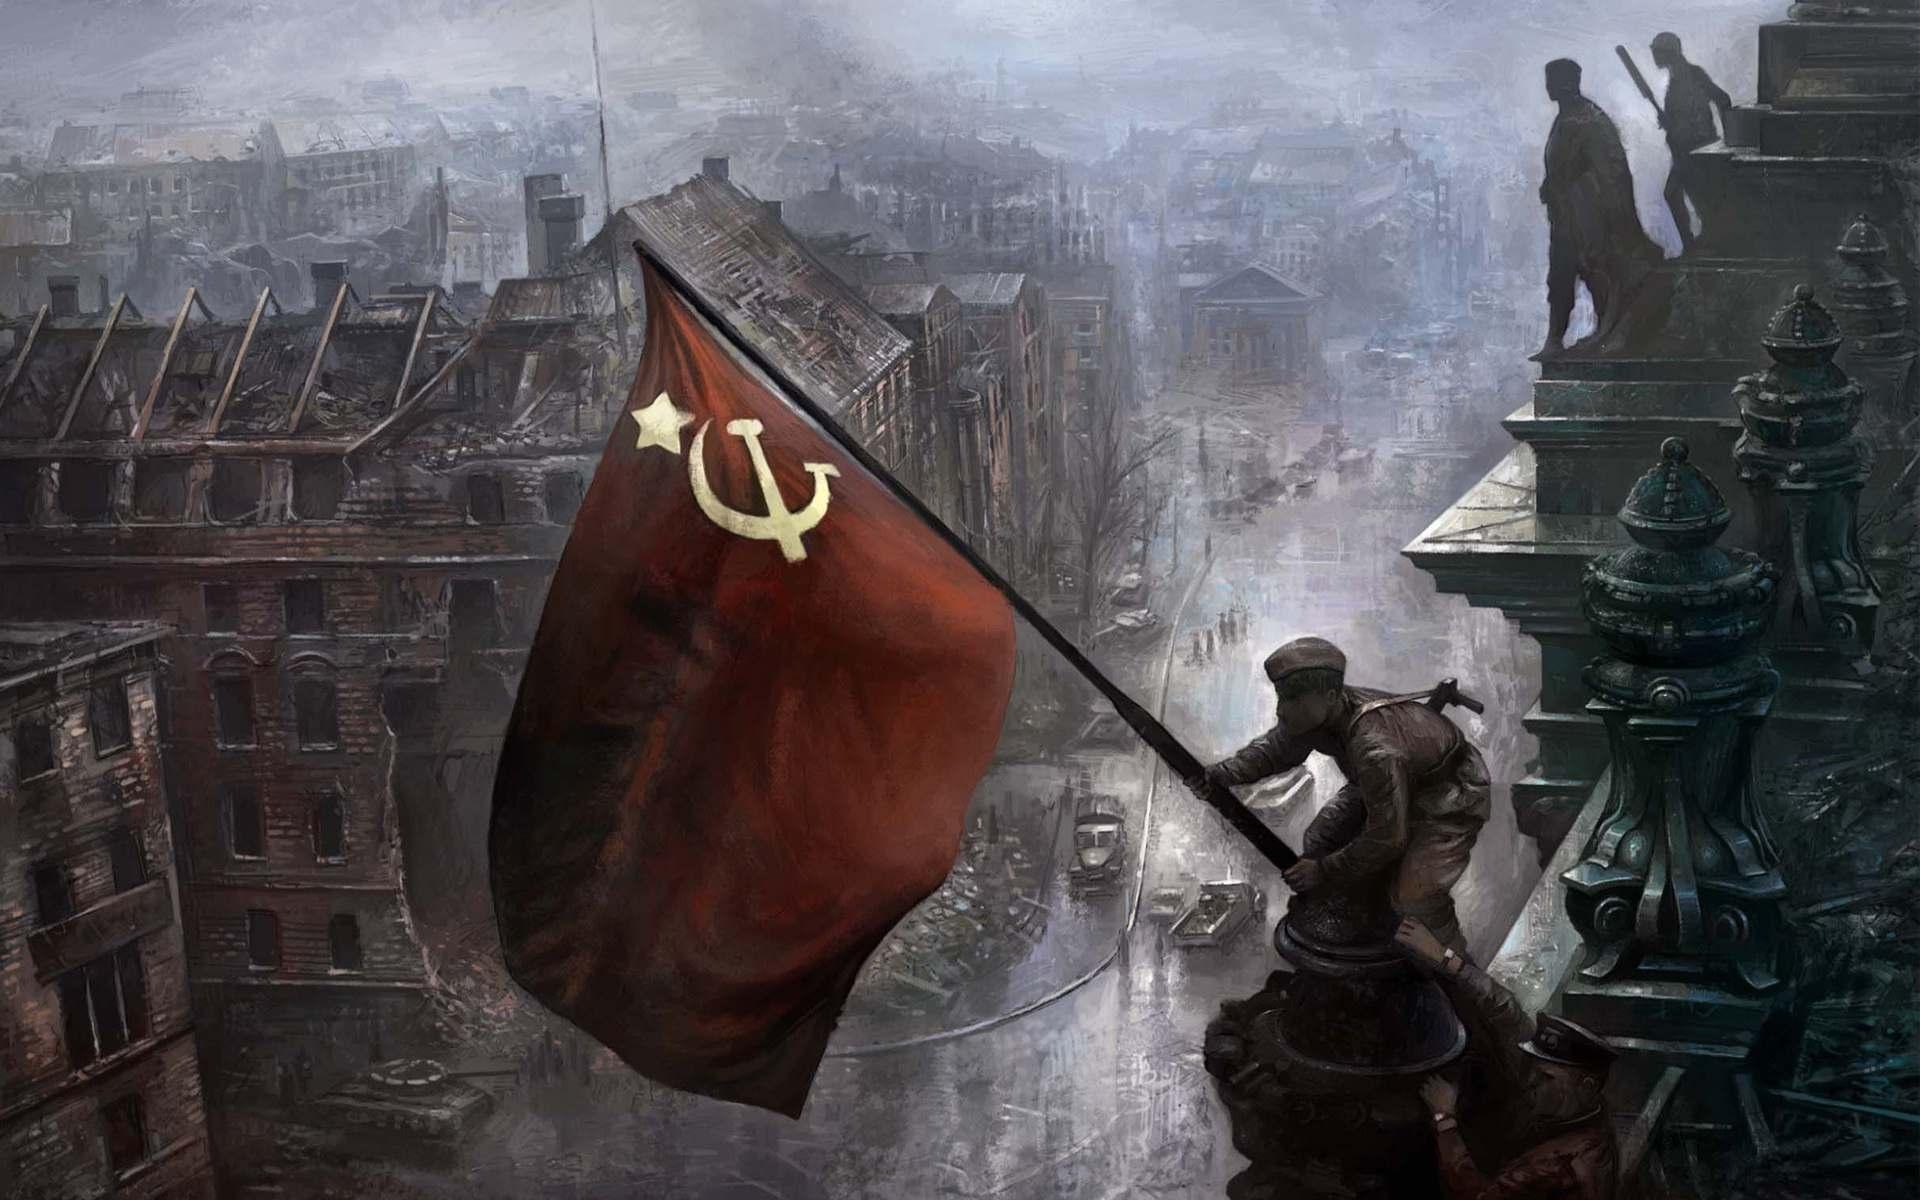 Por qué ser comunista? Zurdo